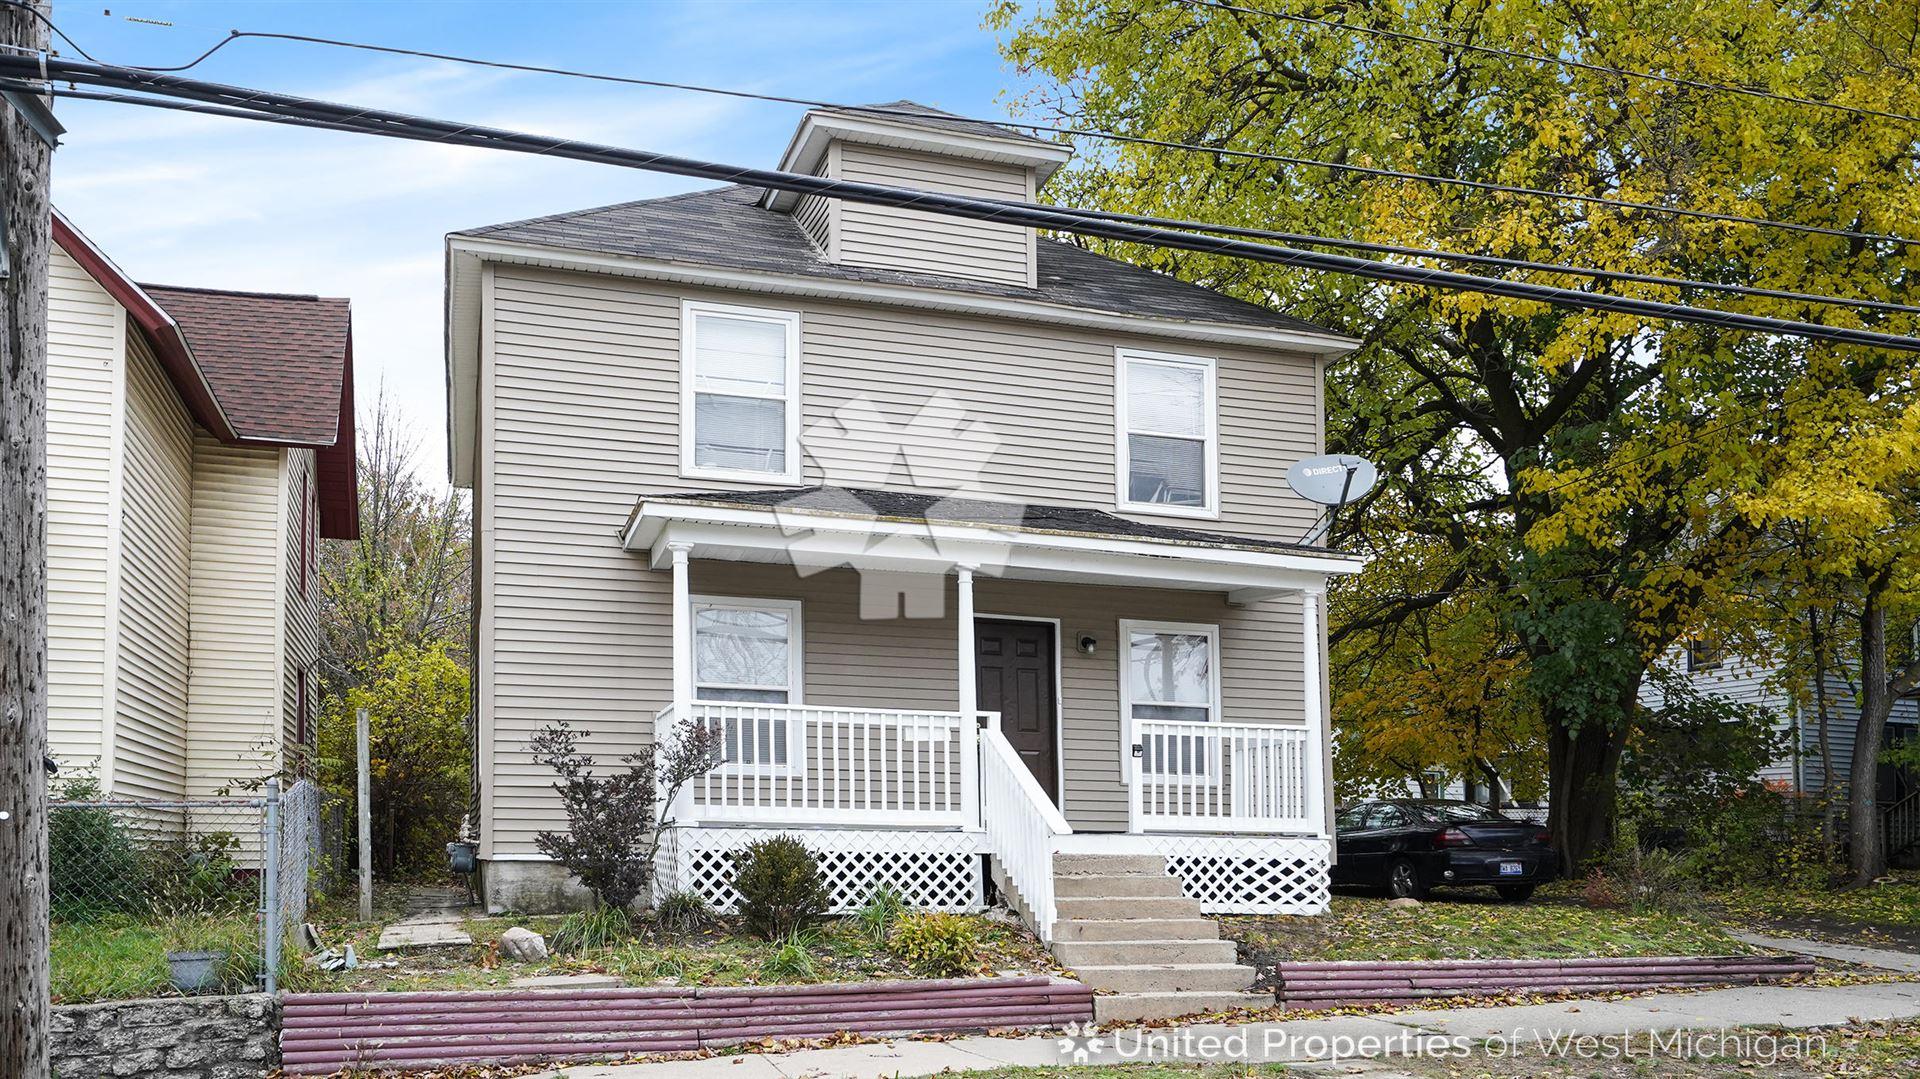 911 Thomas Street SE, Grand Rapids, MI 49506 - MLS#: 21015463